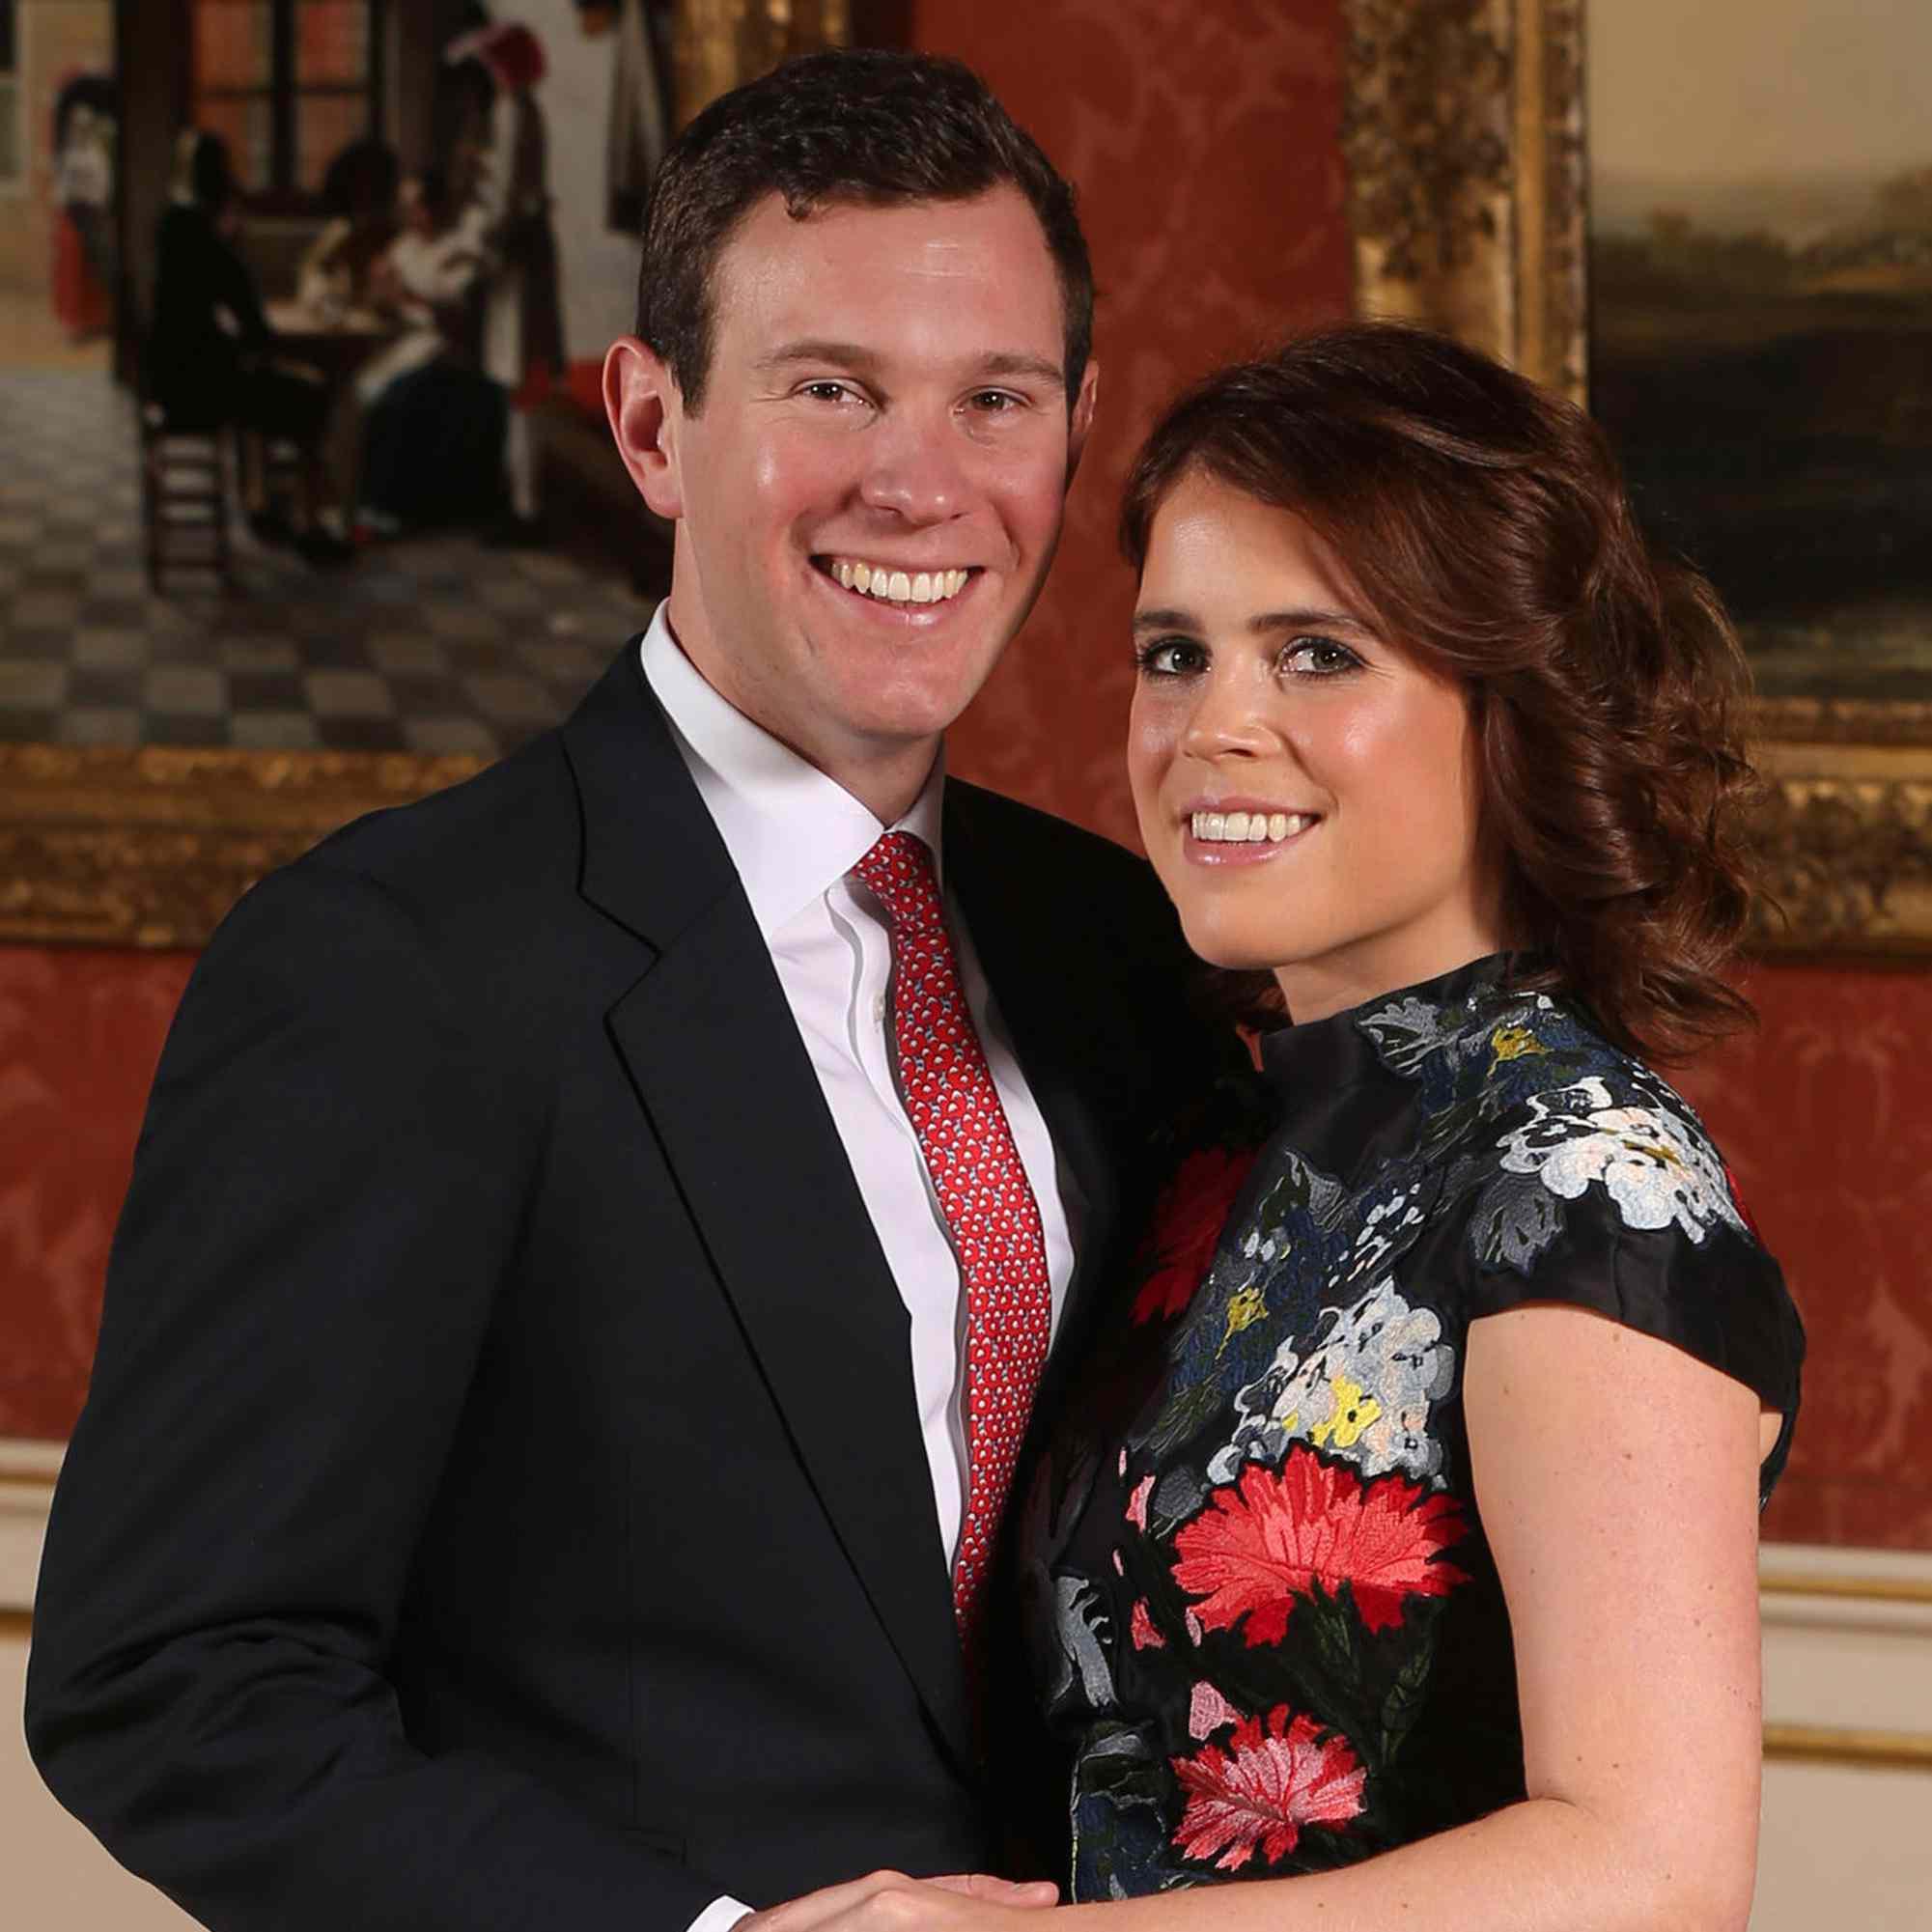 Watch The Royal Wedding.Watch Princess Eugenie And Jack Brooksbank S Royal Wedding Live